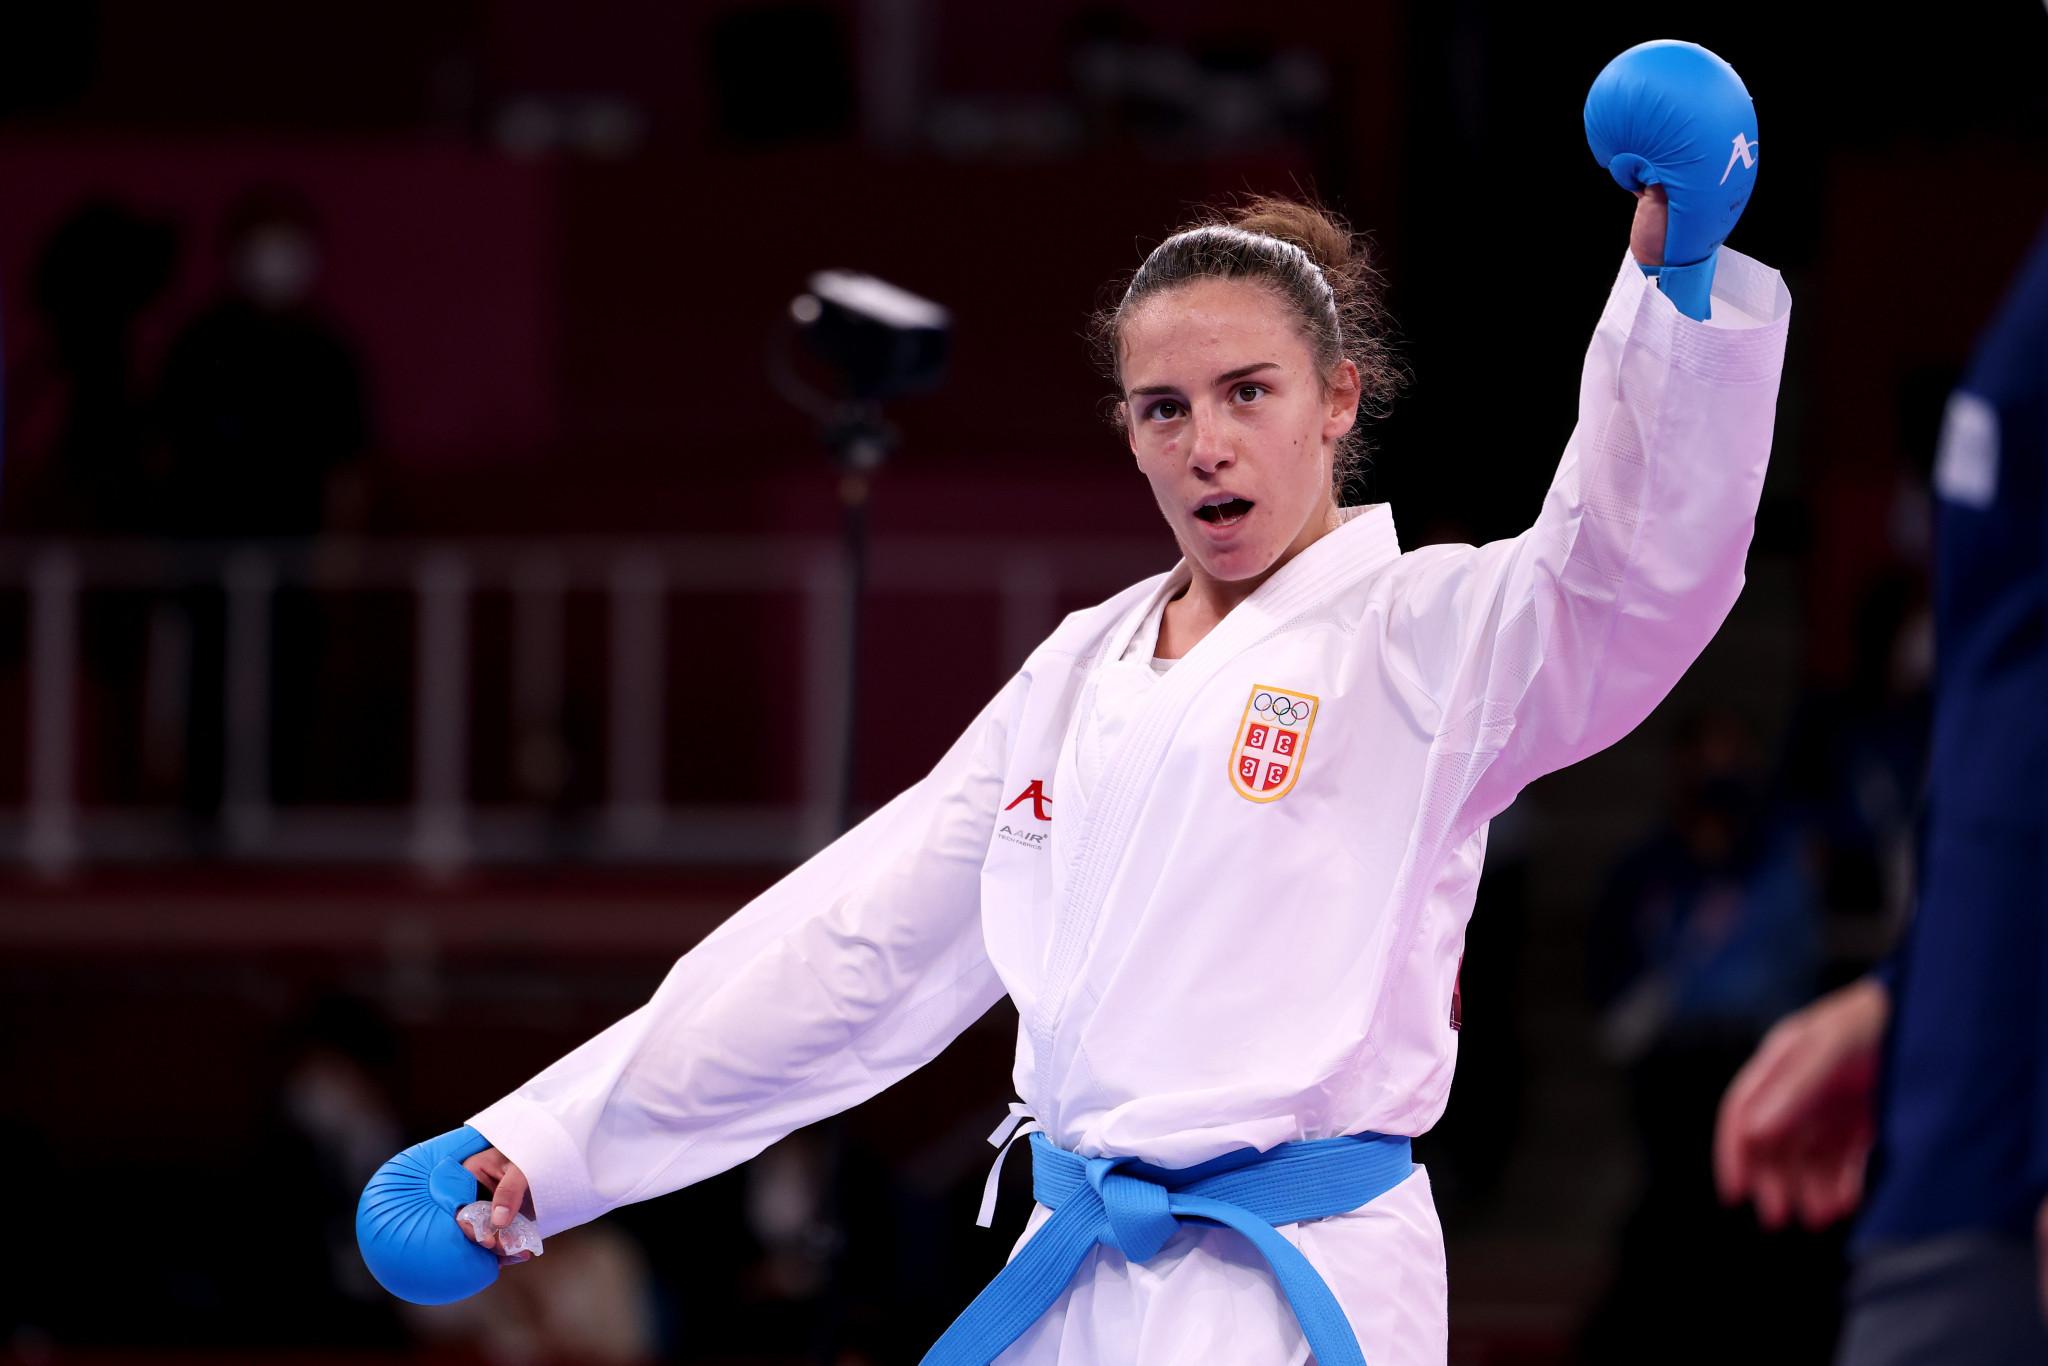 World champion Yovana Prekovic won the women's under-61kg kumite category by a hantei, or majority verdict ©Getty Images